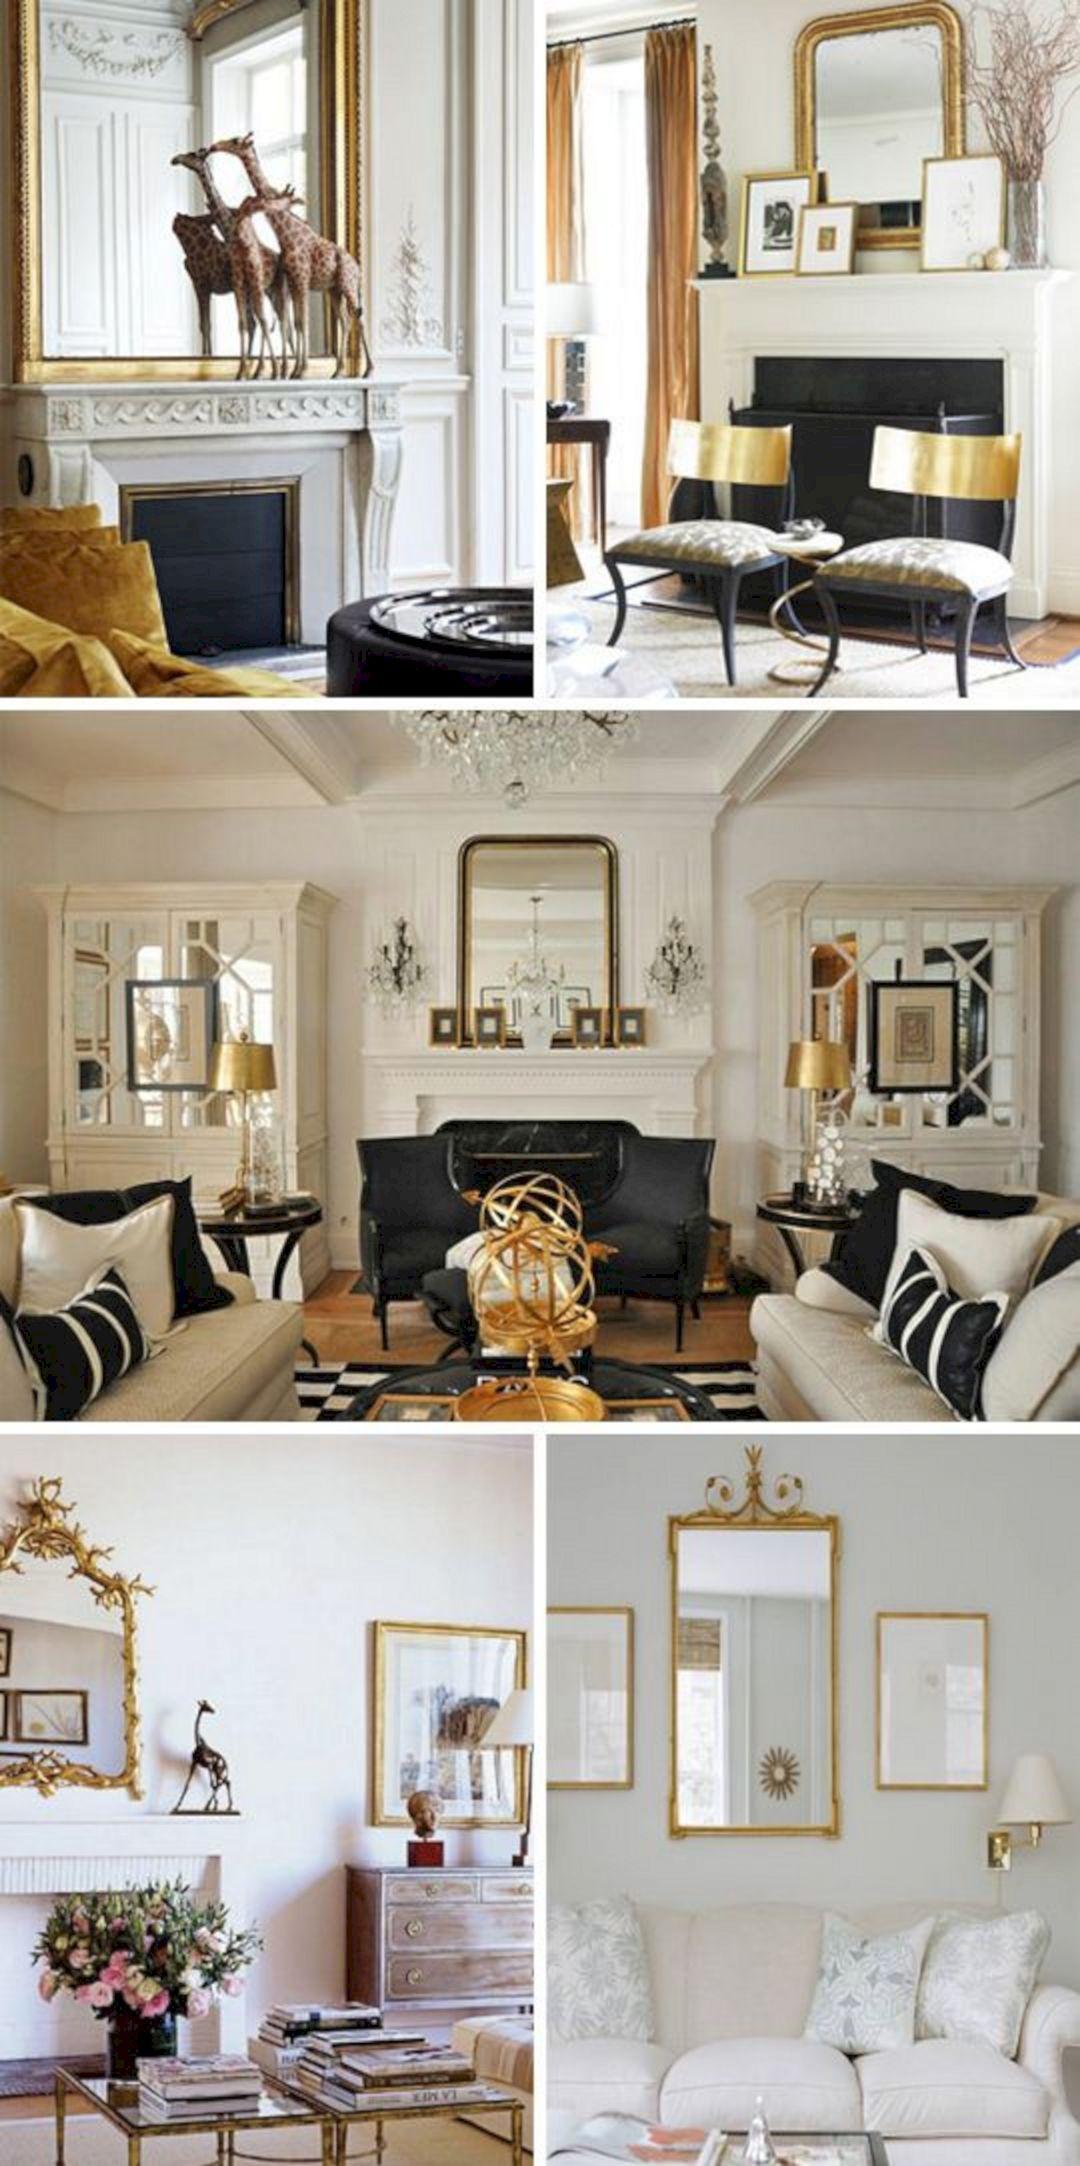 23 Best And Wonderful Black White Gold Living Room Design Ideas Decorating Decor Home